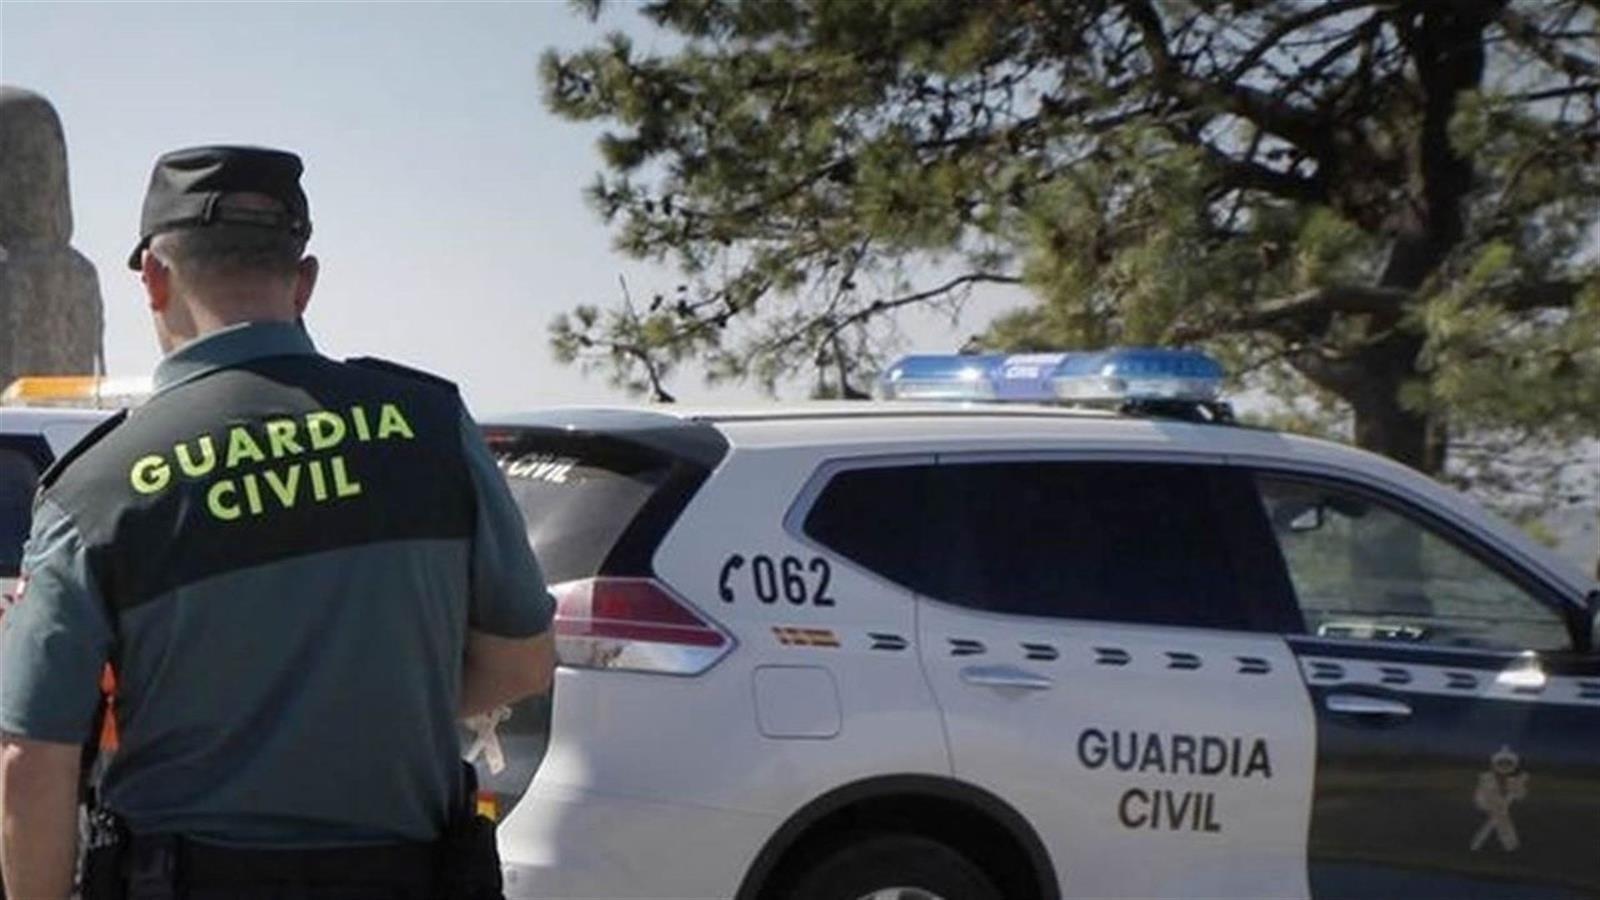 Guardia Civil sorprende a dos individuos con sacos de cáñamo en un invernadero de Albuñol